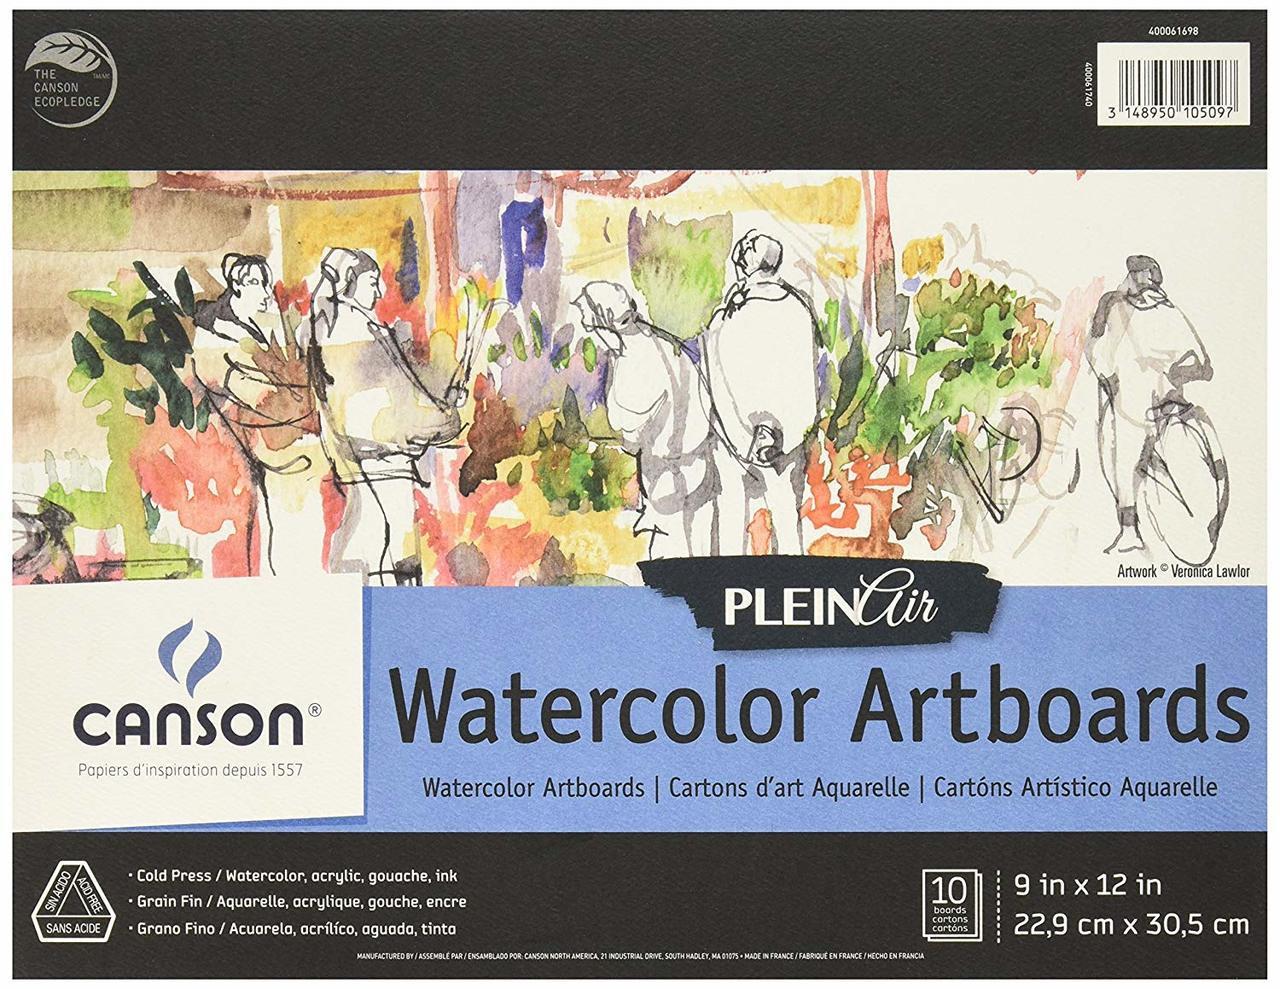 Canson Plein Air Watercolor Artboard 9x12 10sht Pad